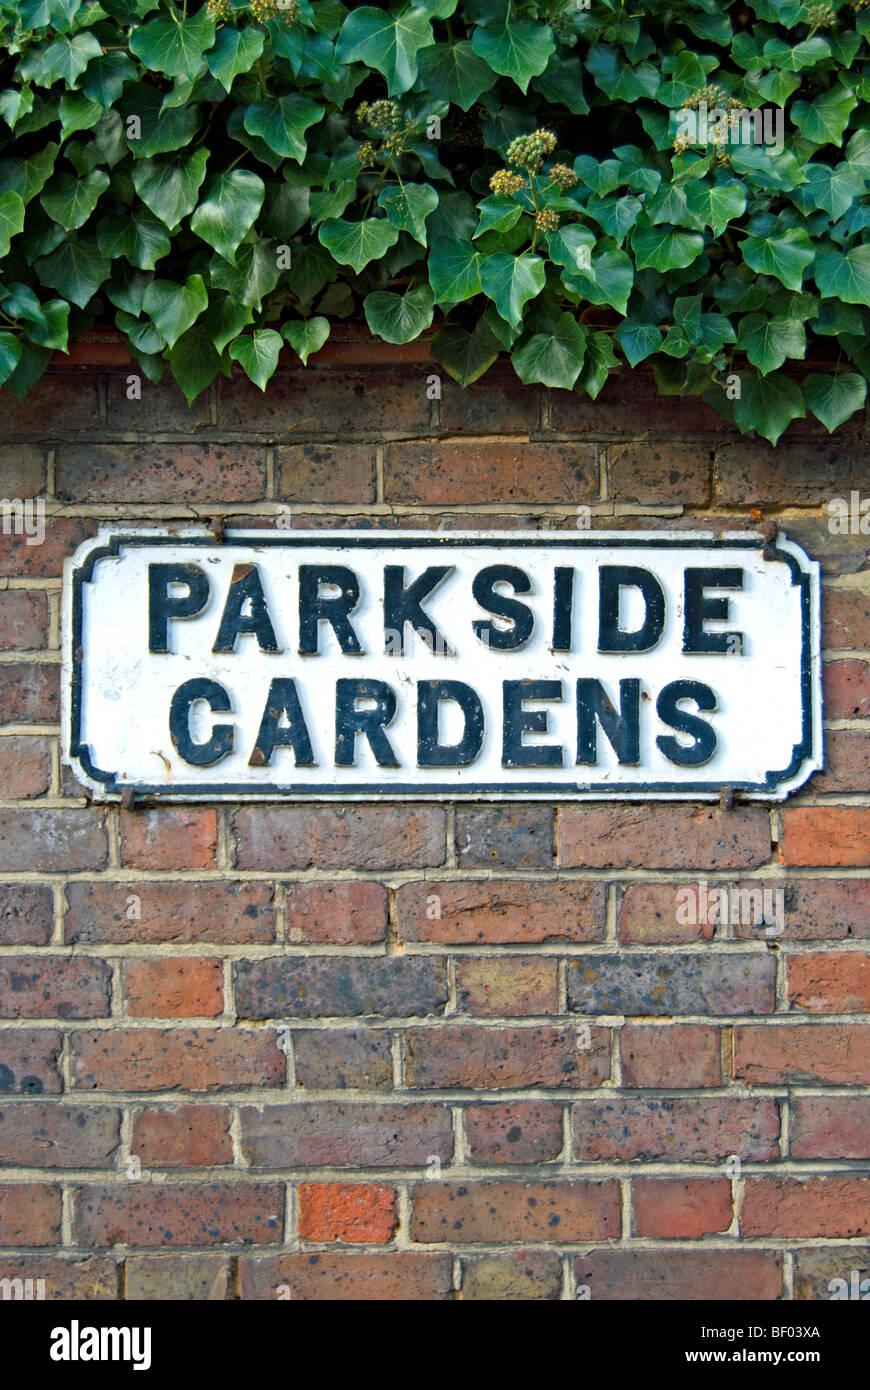 Street Name Sign For Parkside Gardens, Wimbledon, Southwest London, England